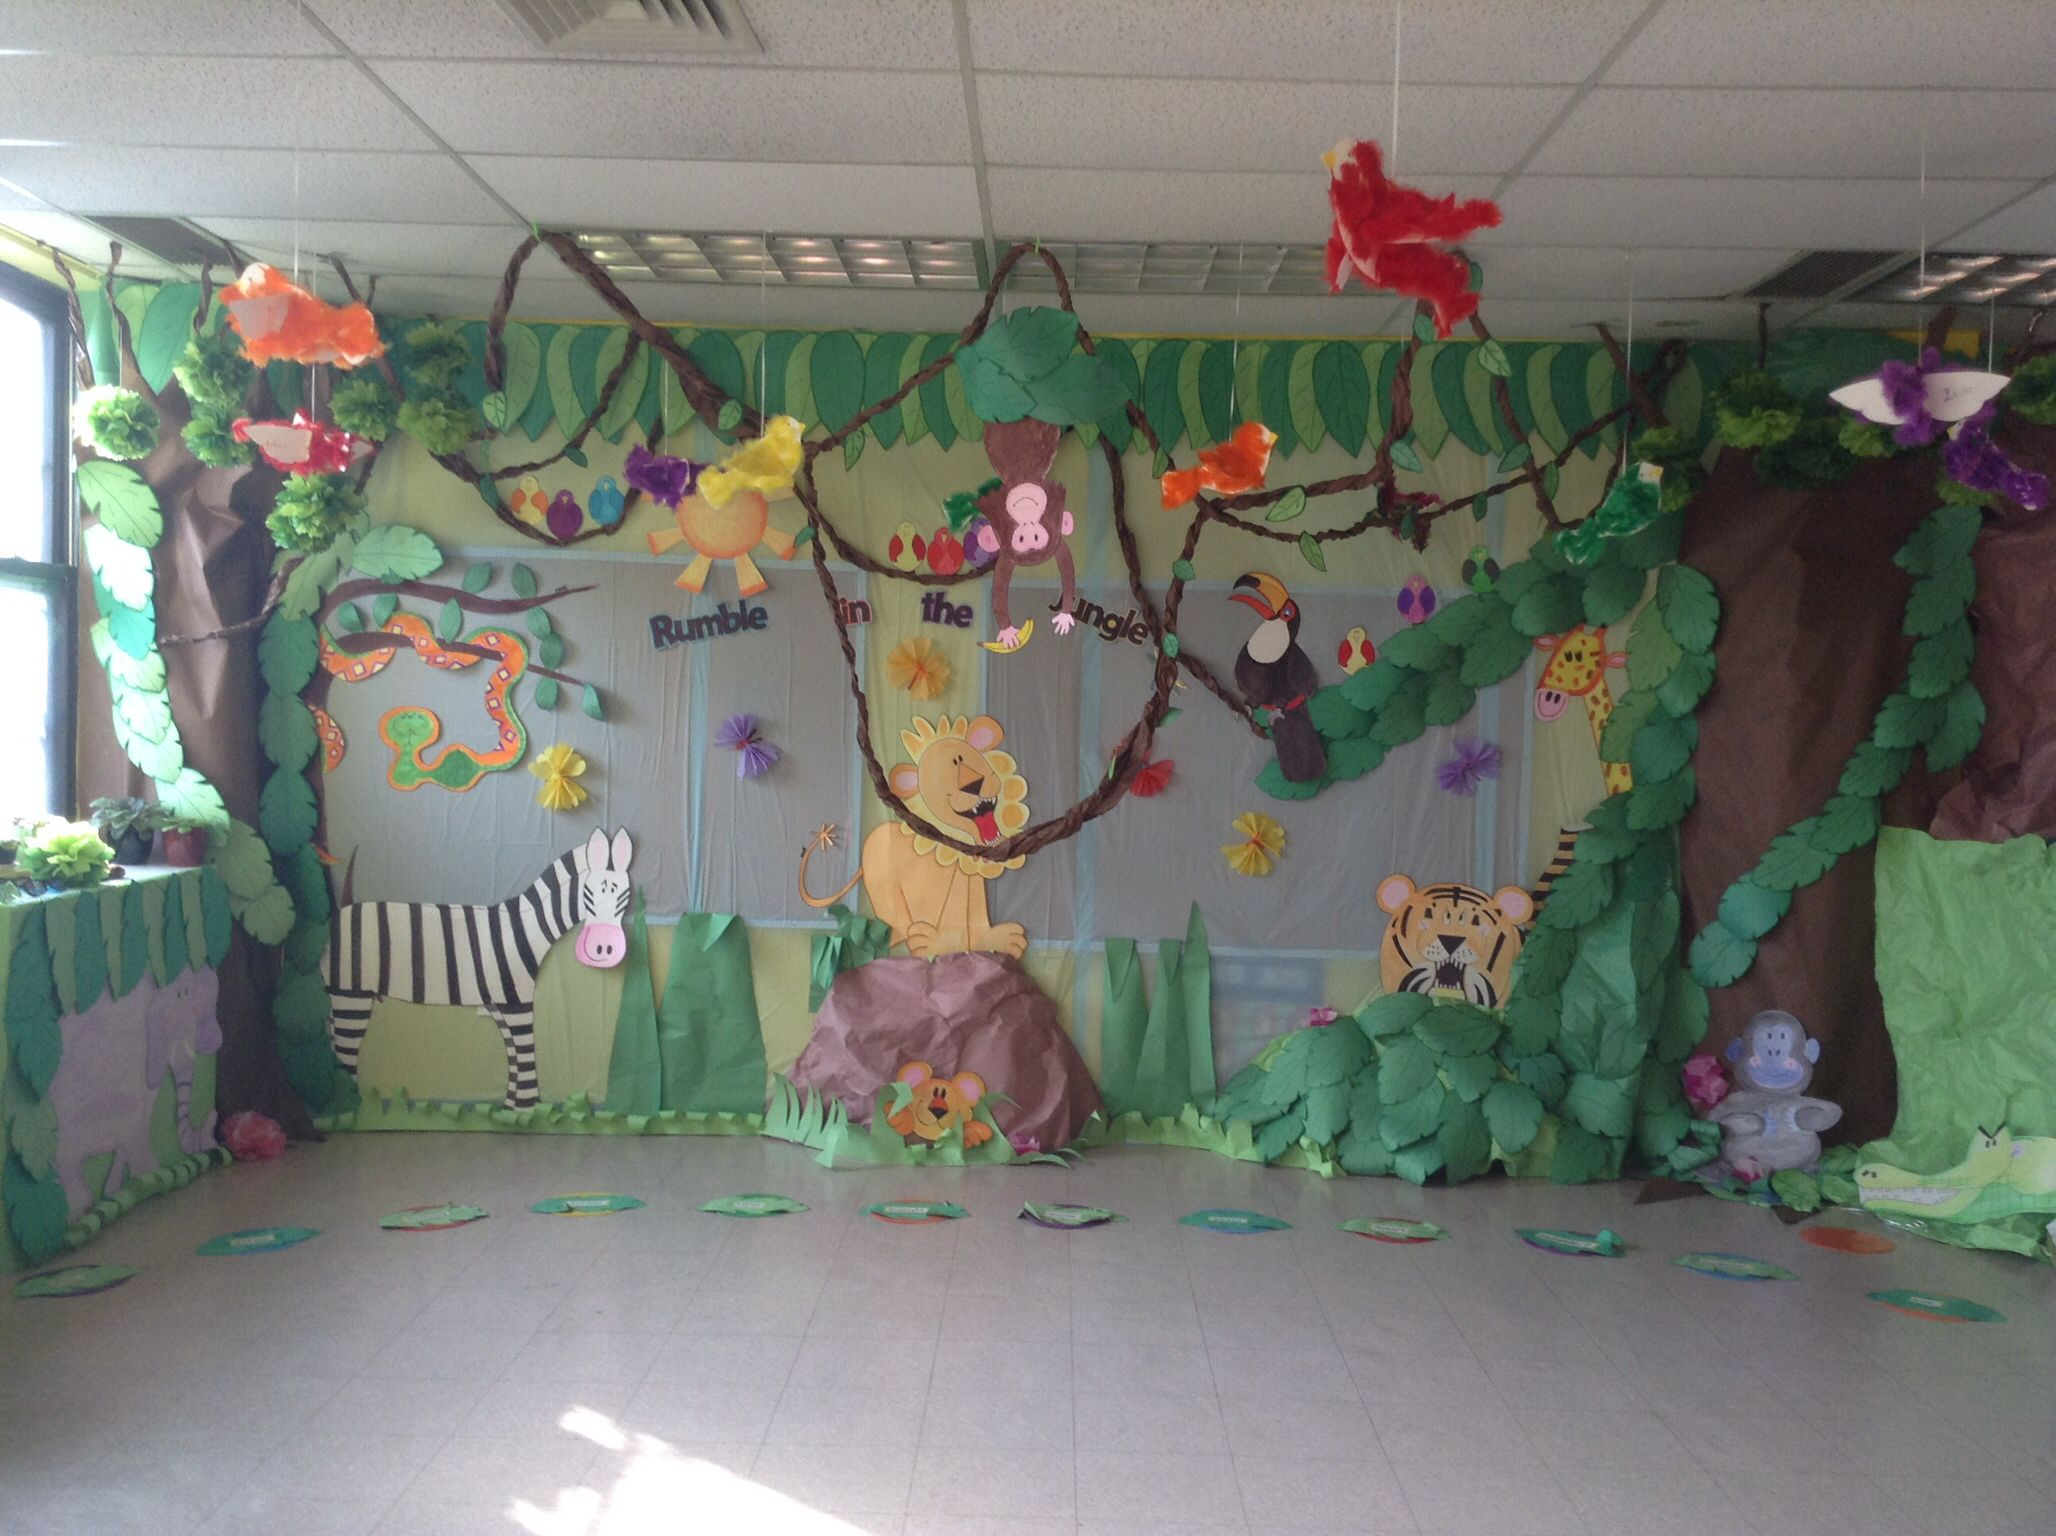 Rumble in the jungle rumble in the jungle pinterest for Ideas sobre decoracion